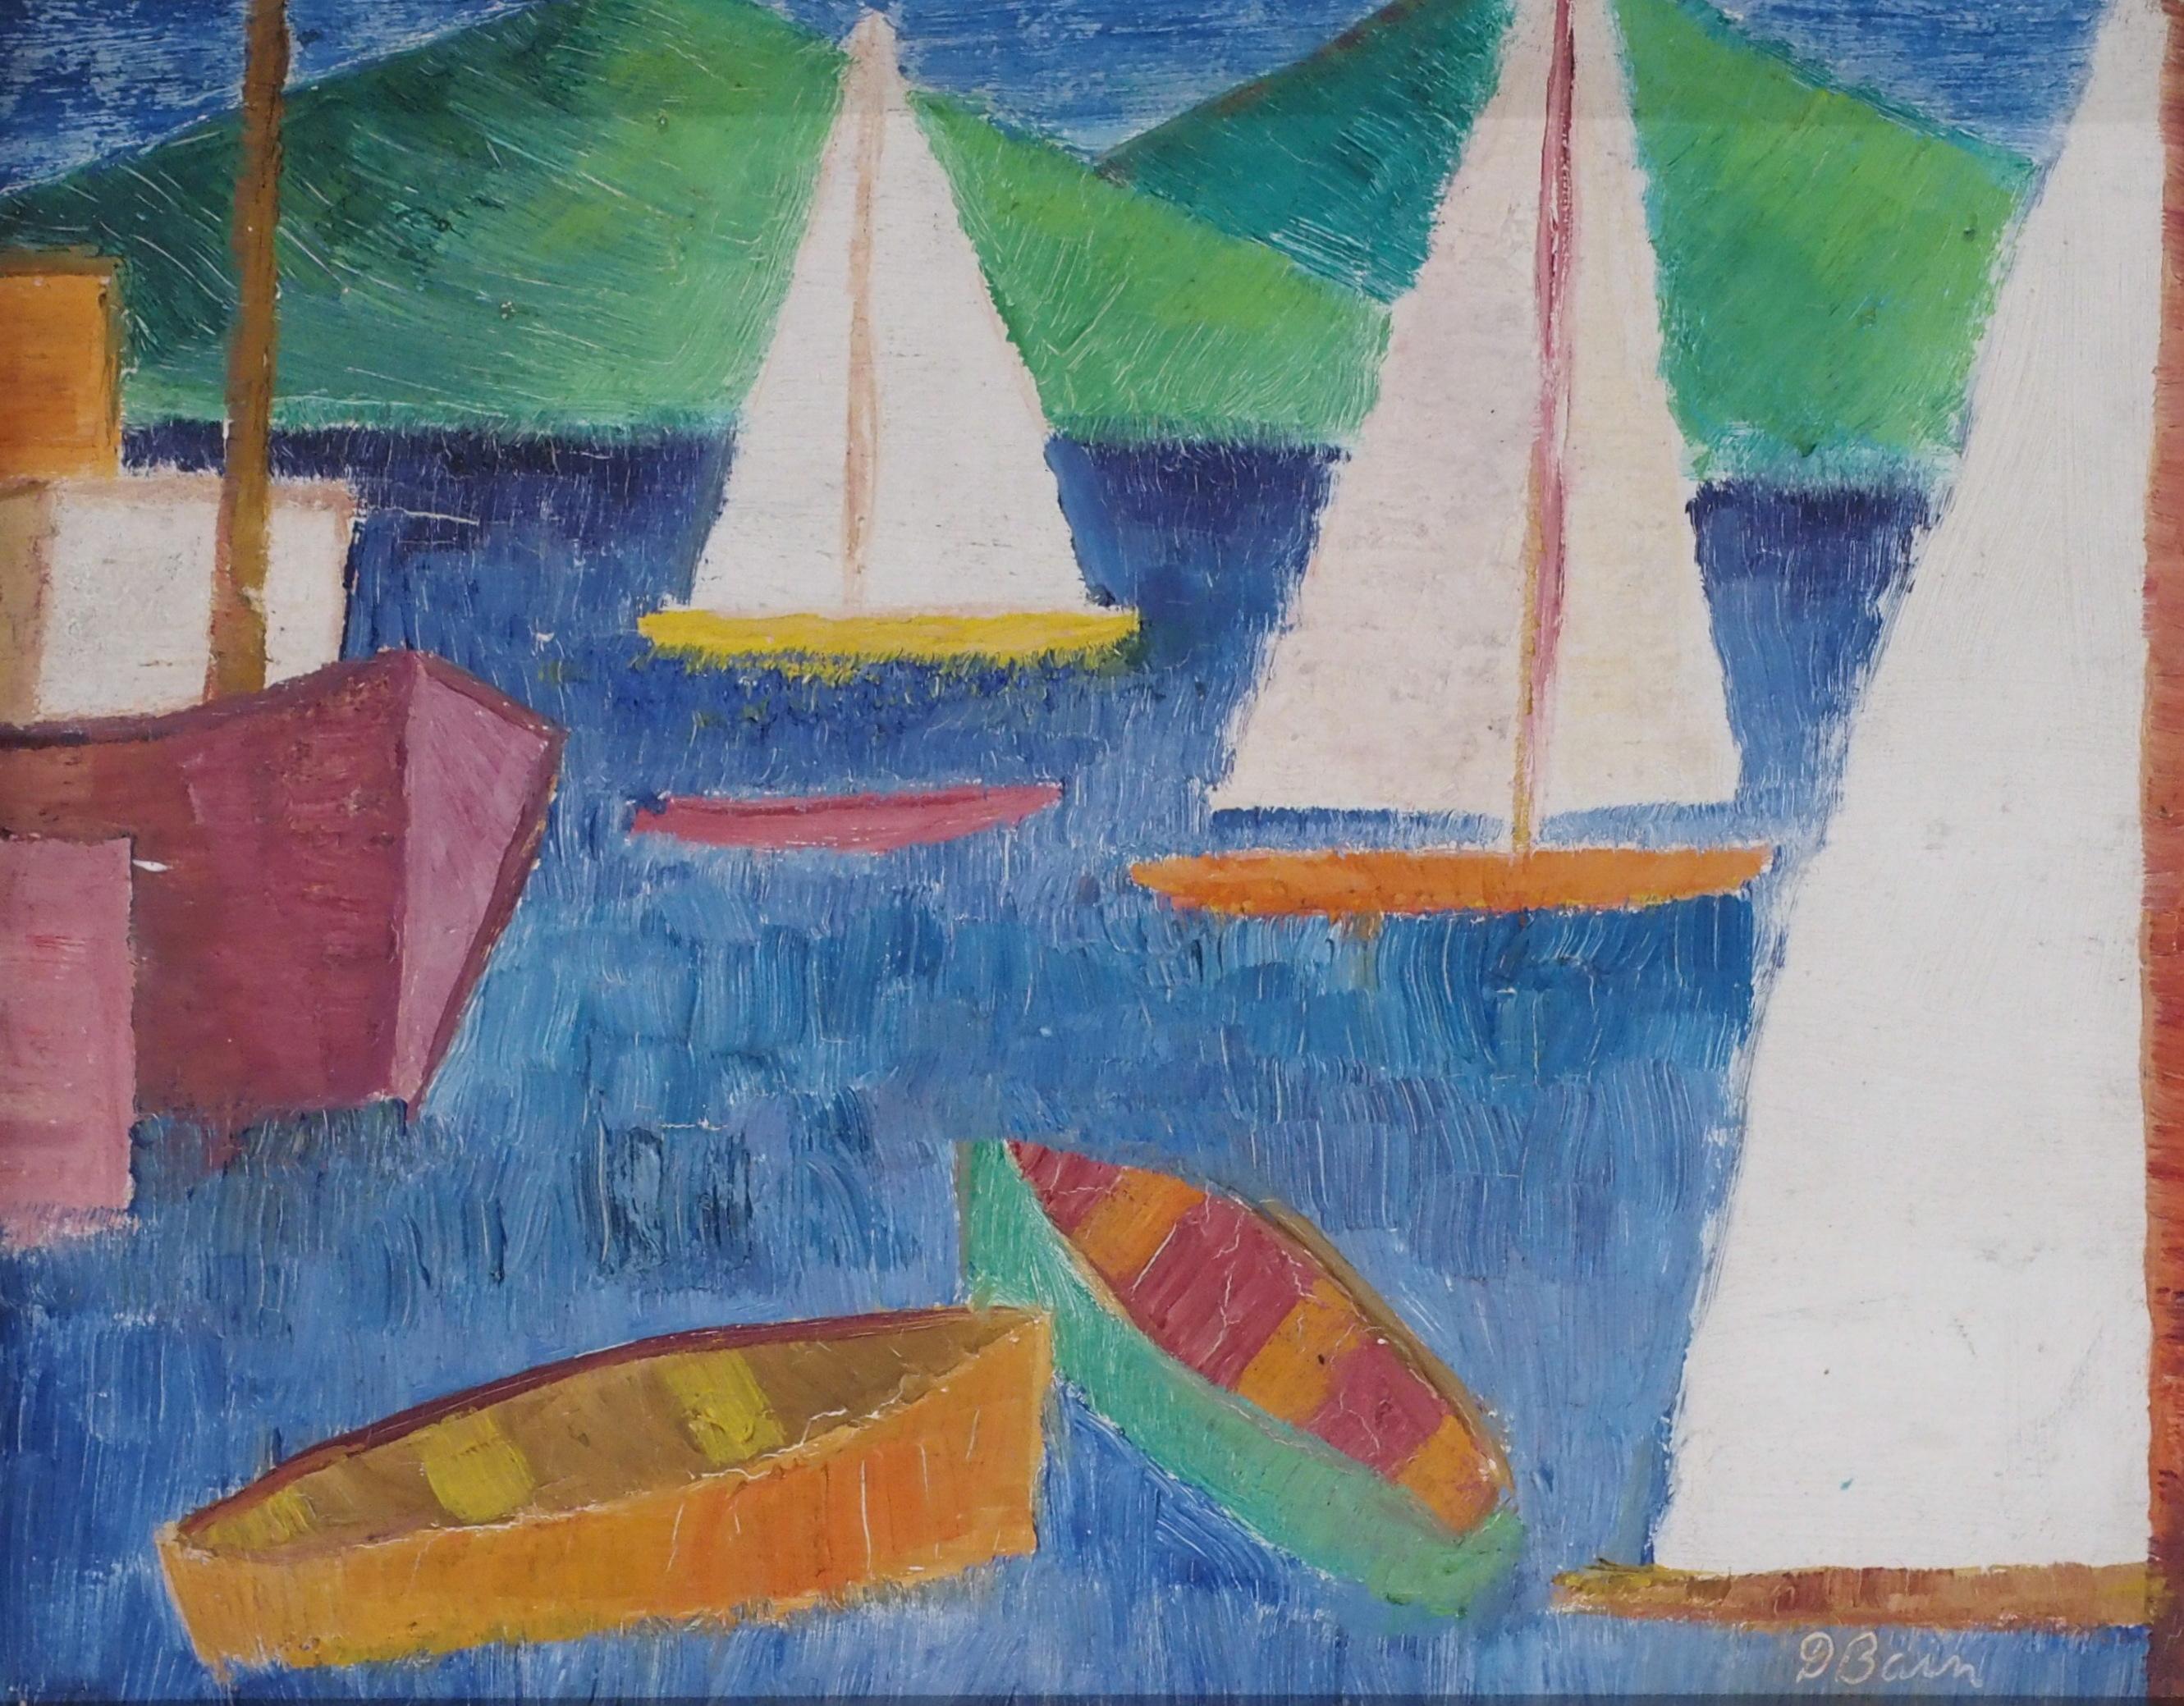 •DONALD BAIN (SCOTTISH 1904-1979) VACANCE DE MER oil on board, signed, 24 x 31cm William Hardie